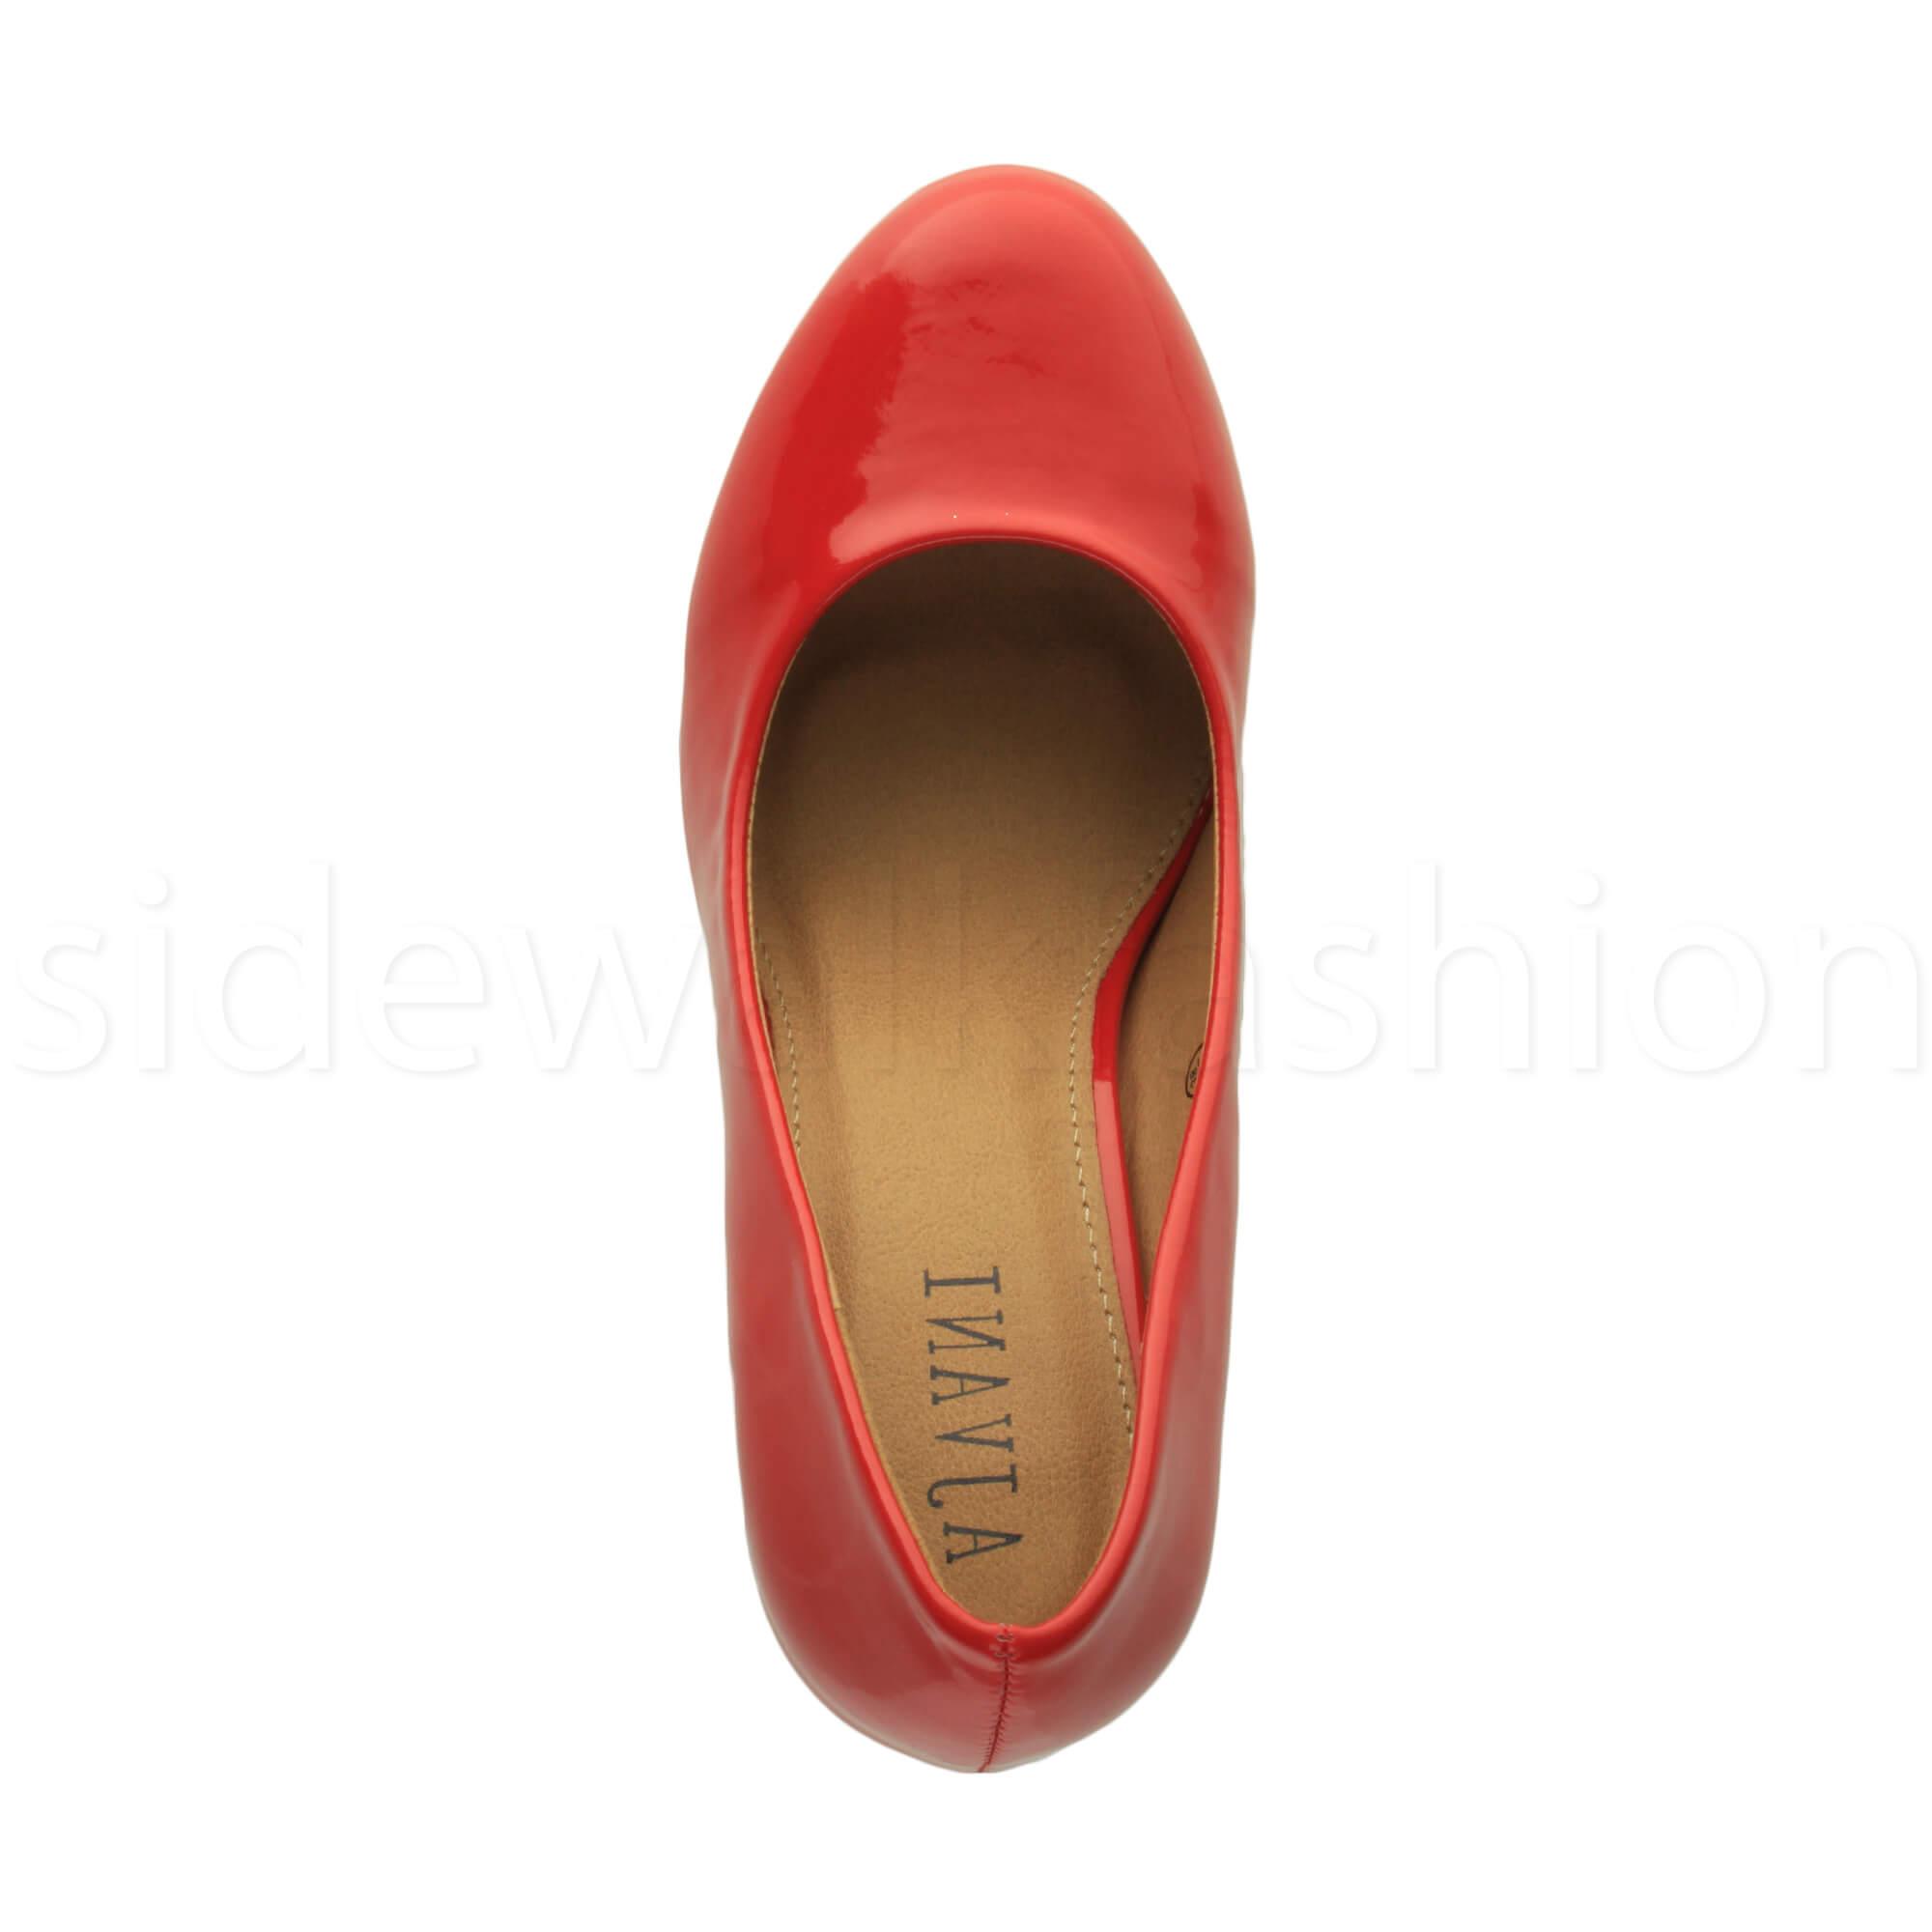 Womens-ladies-high-mid-heel-platform-wedding-evening-bridesmaid-court-shoes-size thumbnail 147